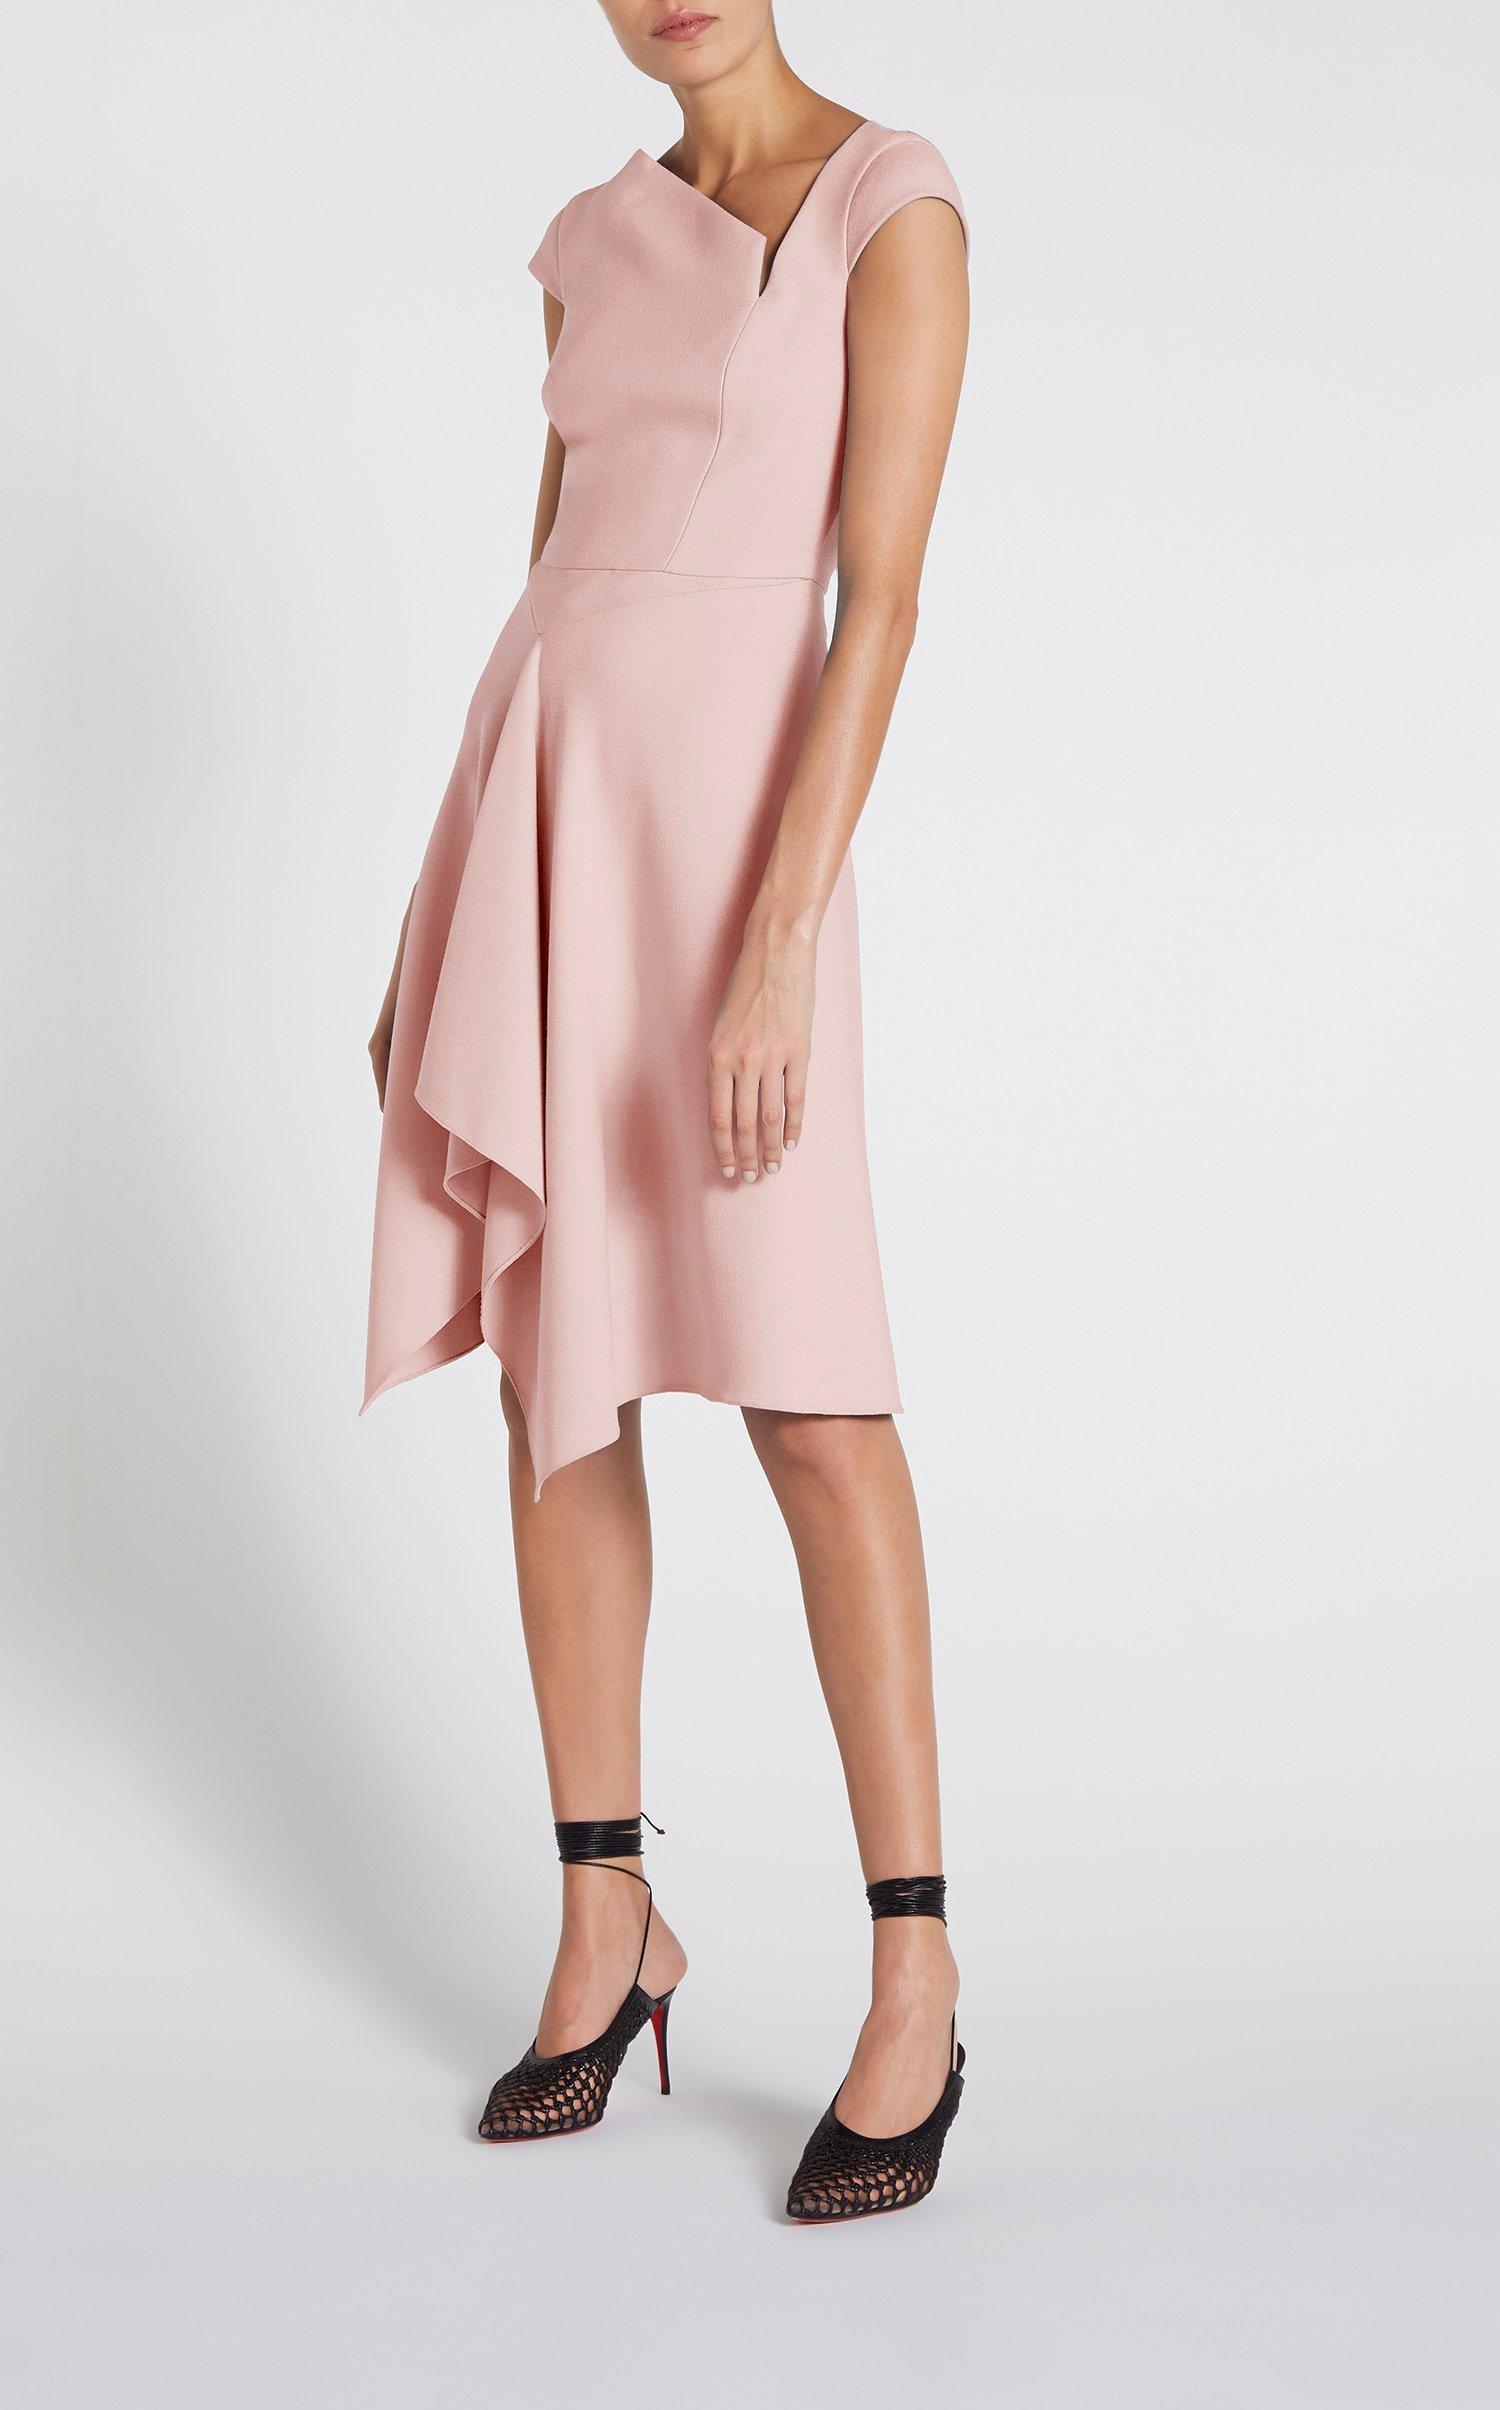 8d1895b3703 Roland Mouret. Women s Pink Augustus Dress.  1